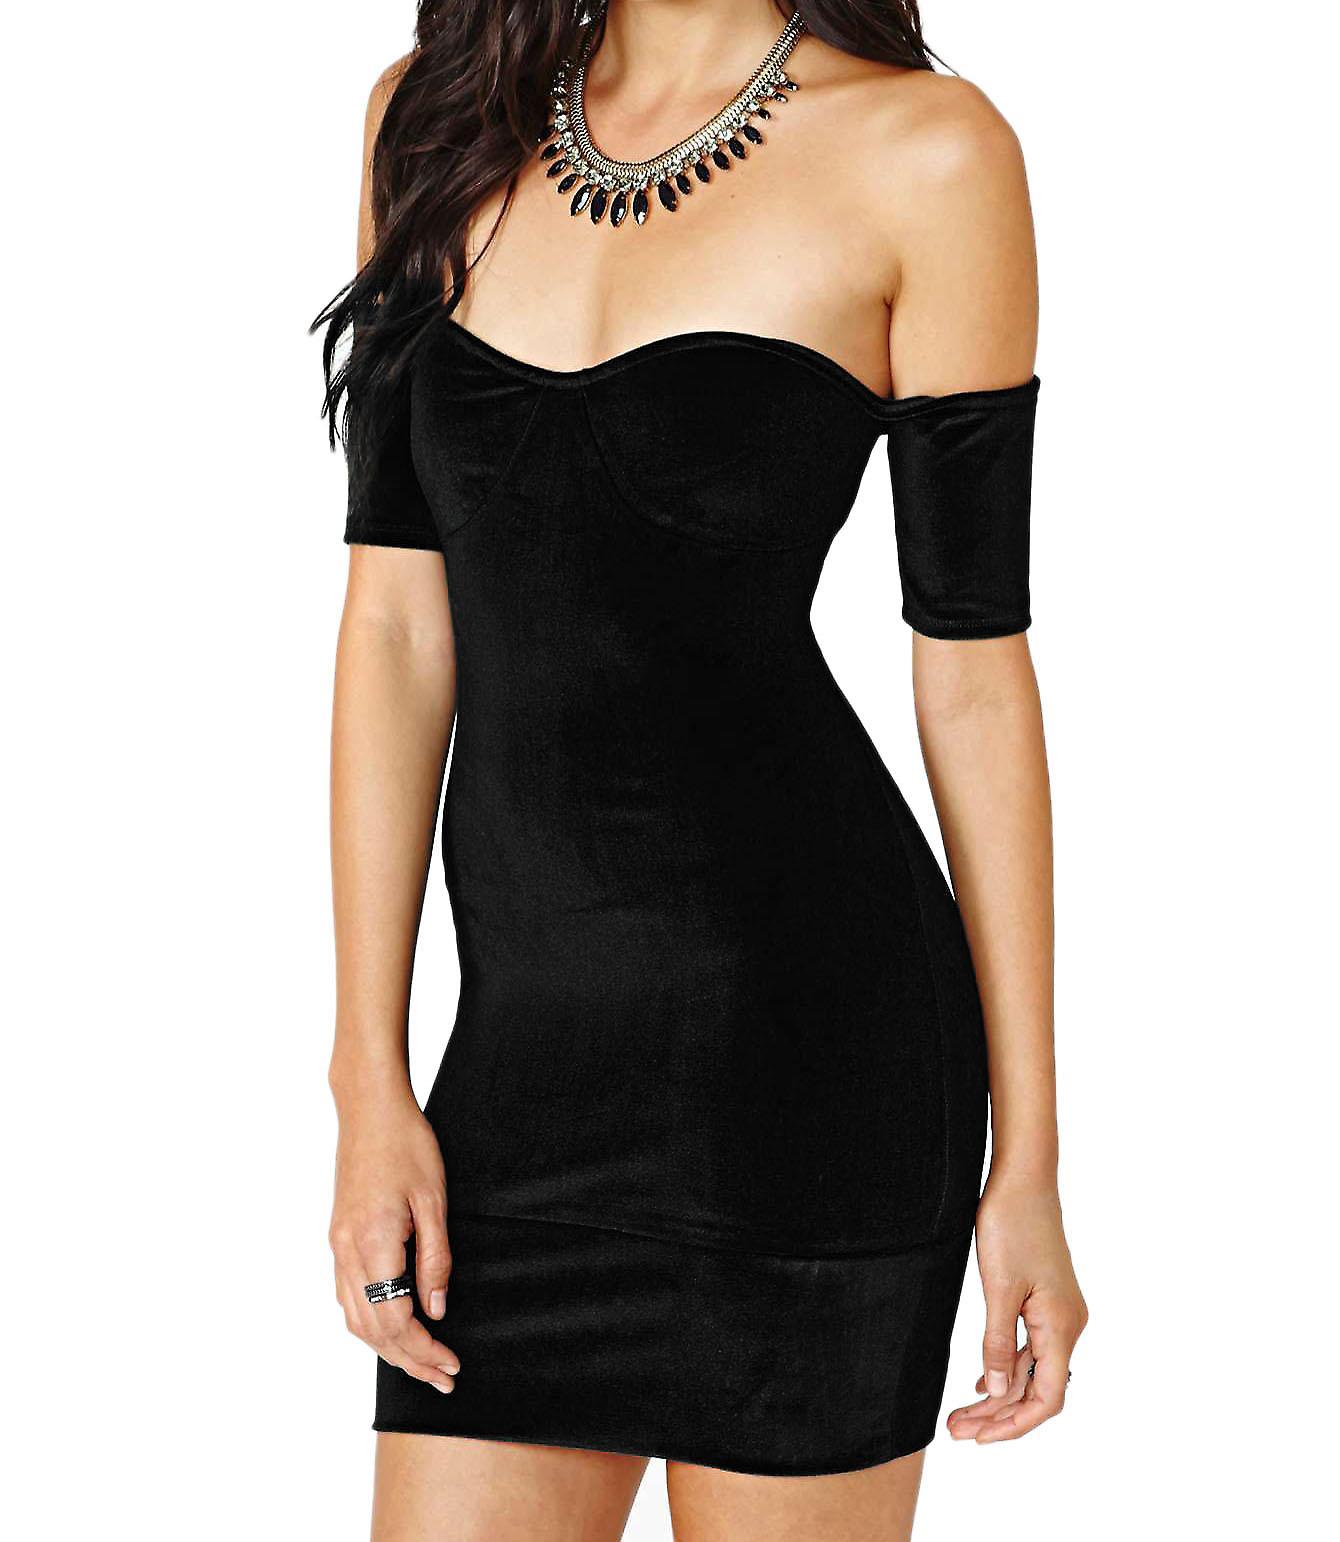 Waooh - Fashion - Dress velvet